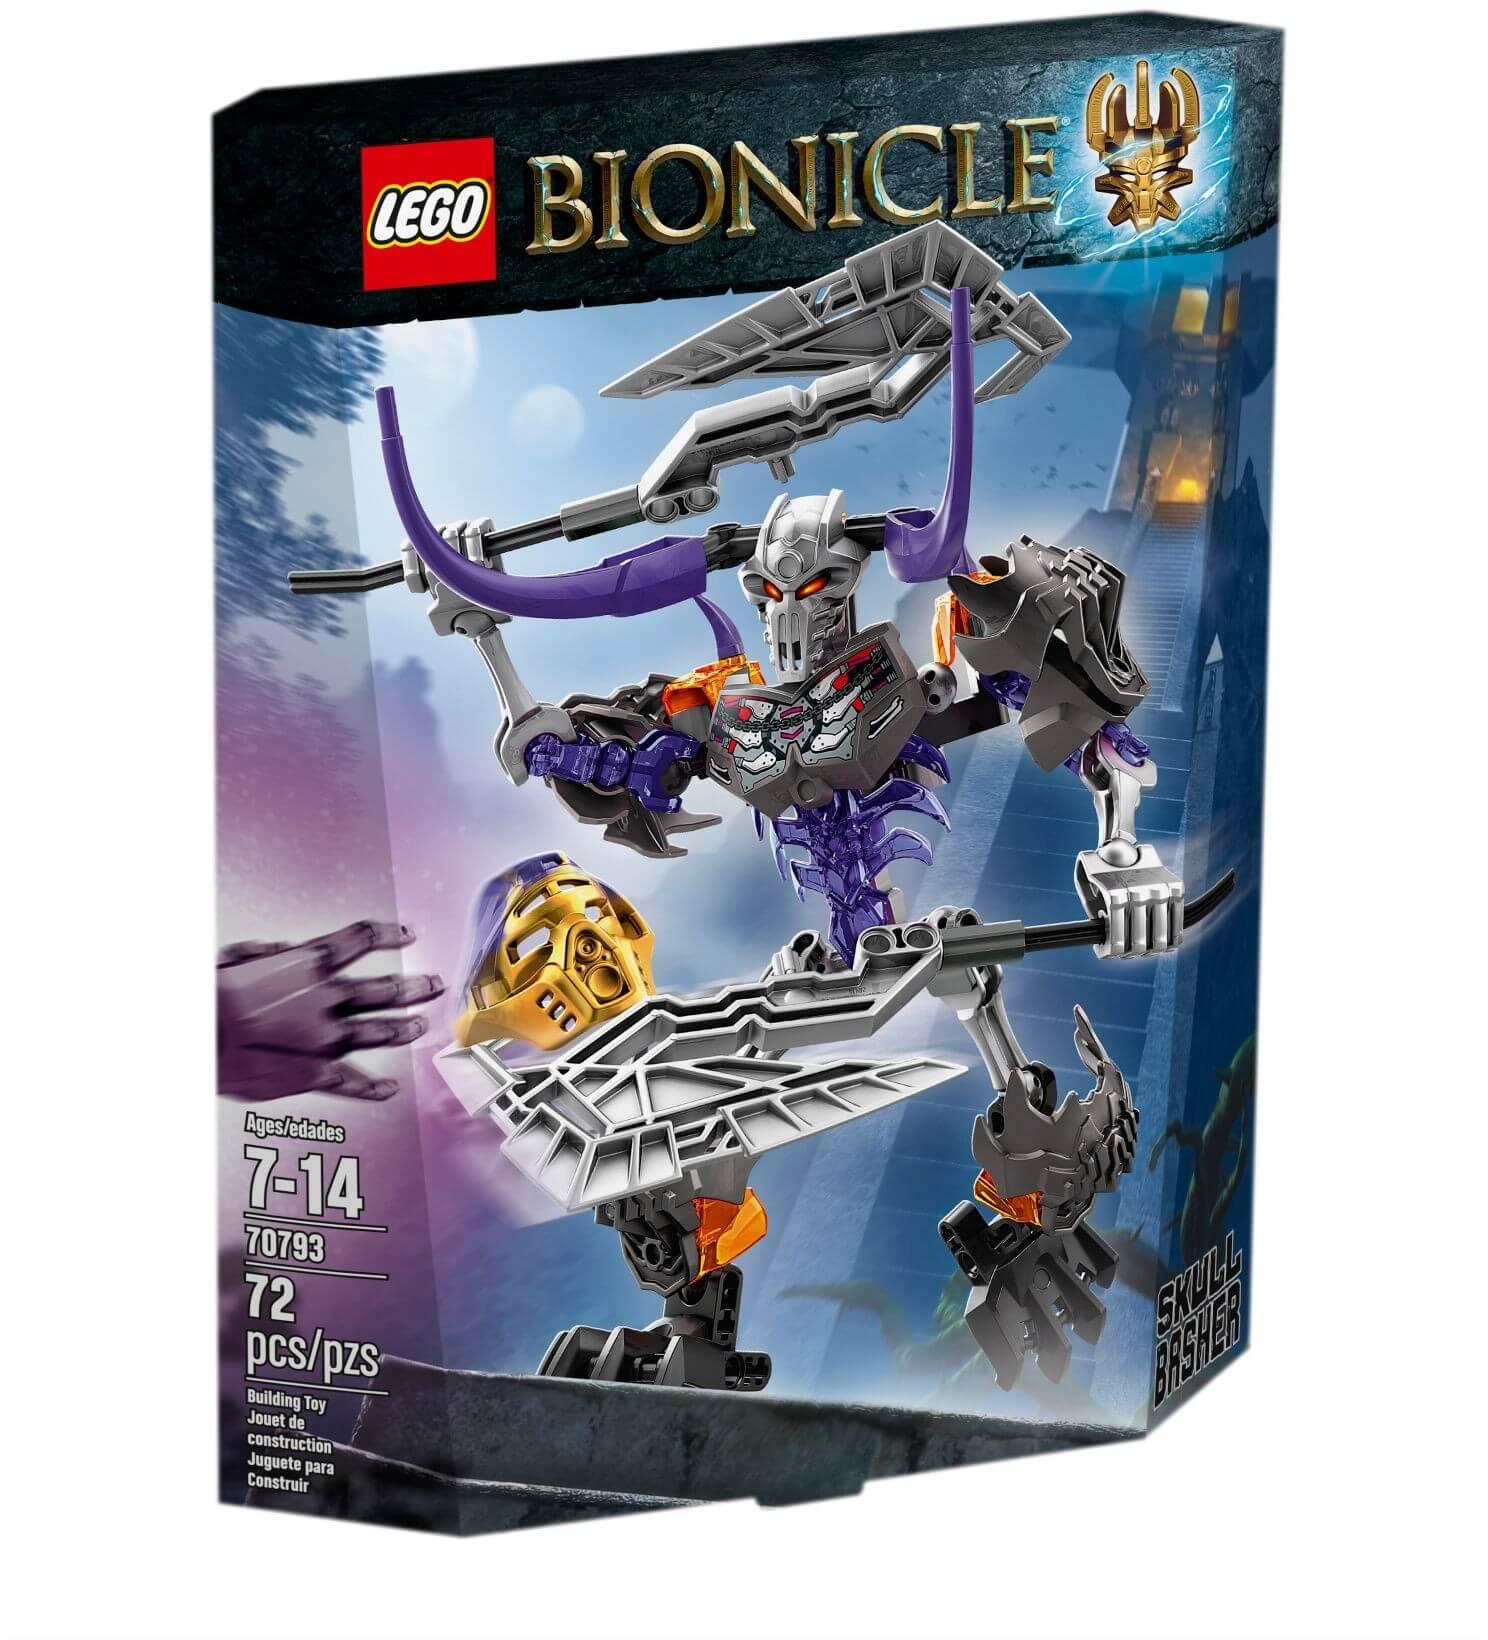 Mua đồ chơi LEGO 70793 - LEGO BIONICLE 70793 - Đồ Tể Đầu Sọ (LEGO BIONICLE Skull Basher 70793)